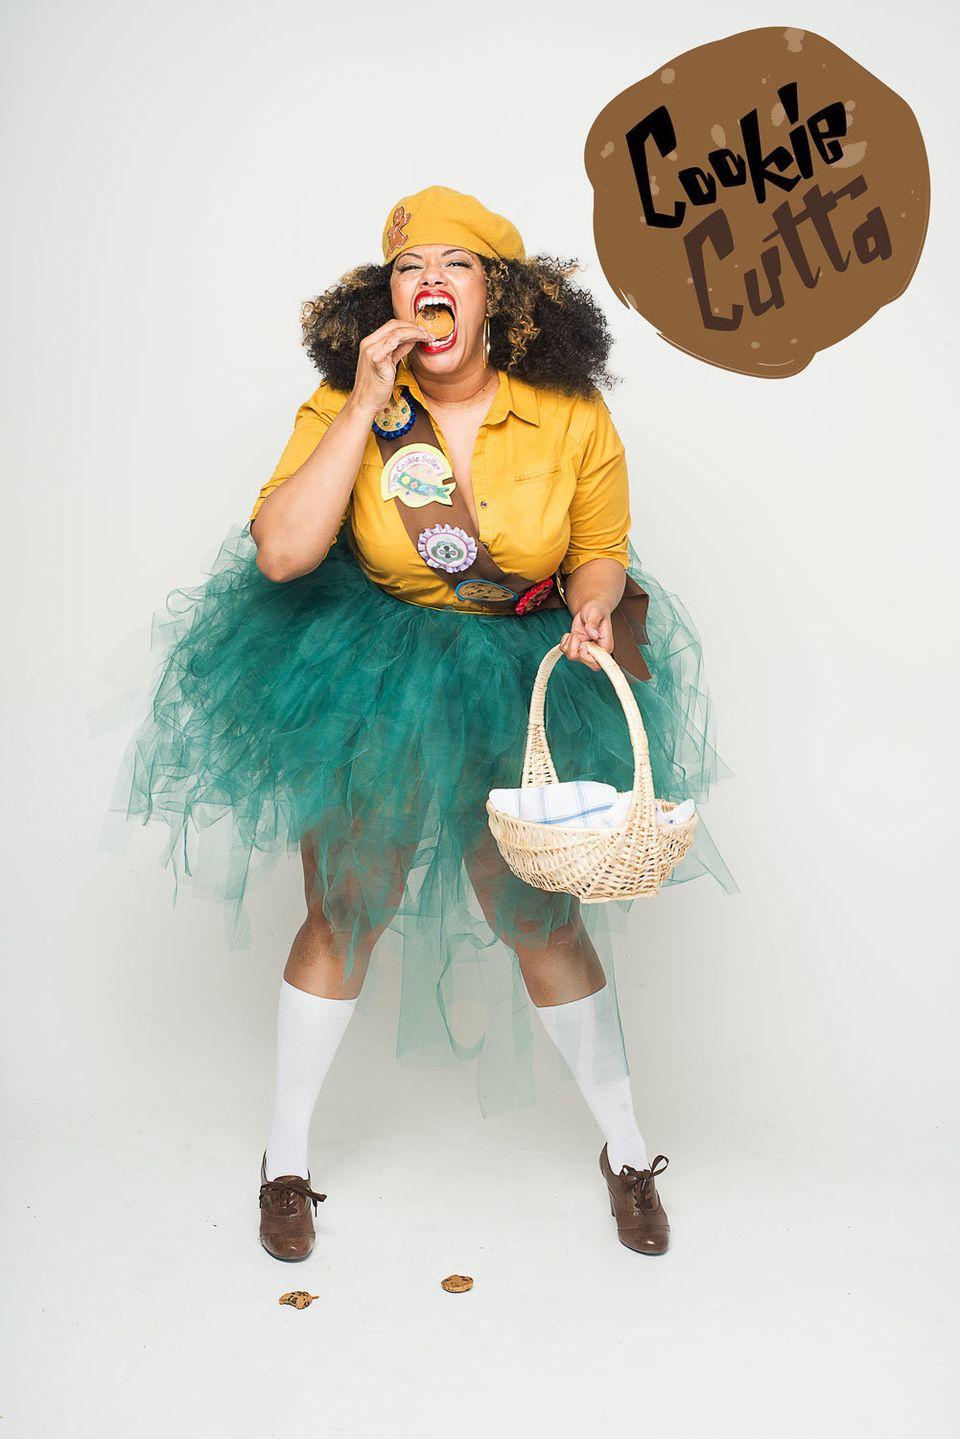 Rachel Marcus is Cookie Cutta.